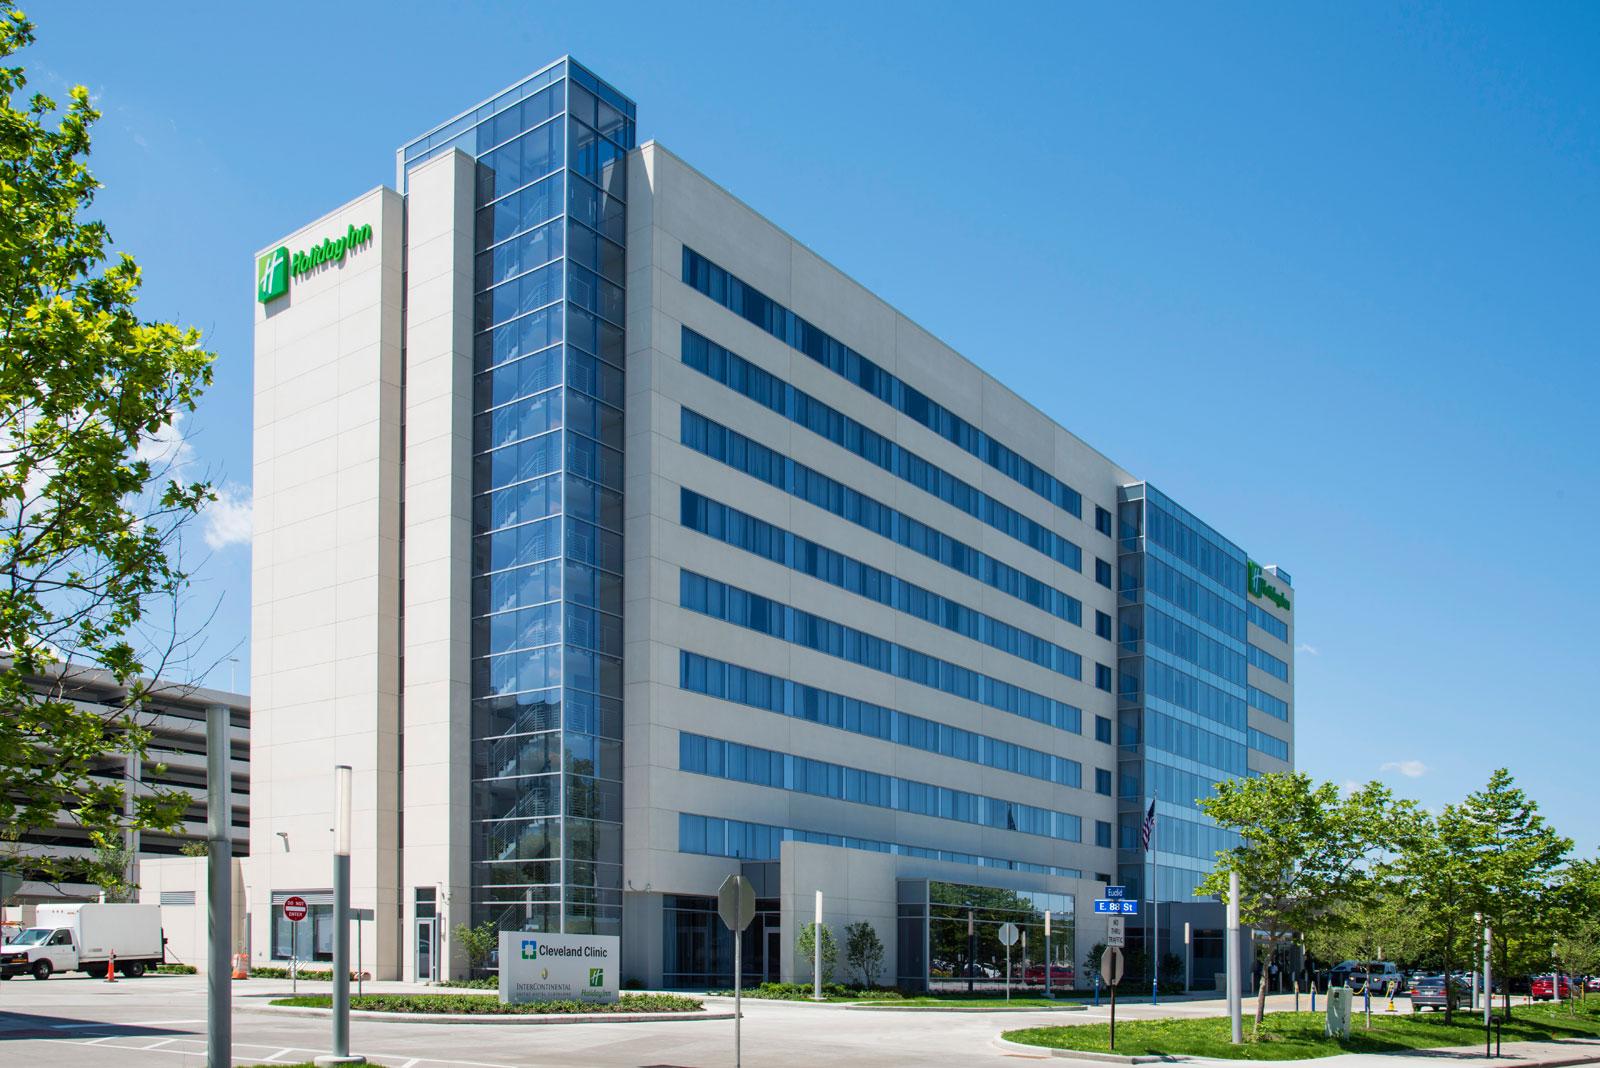 Cleveland Clinic Holiday Inn Ohio